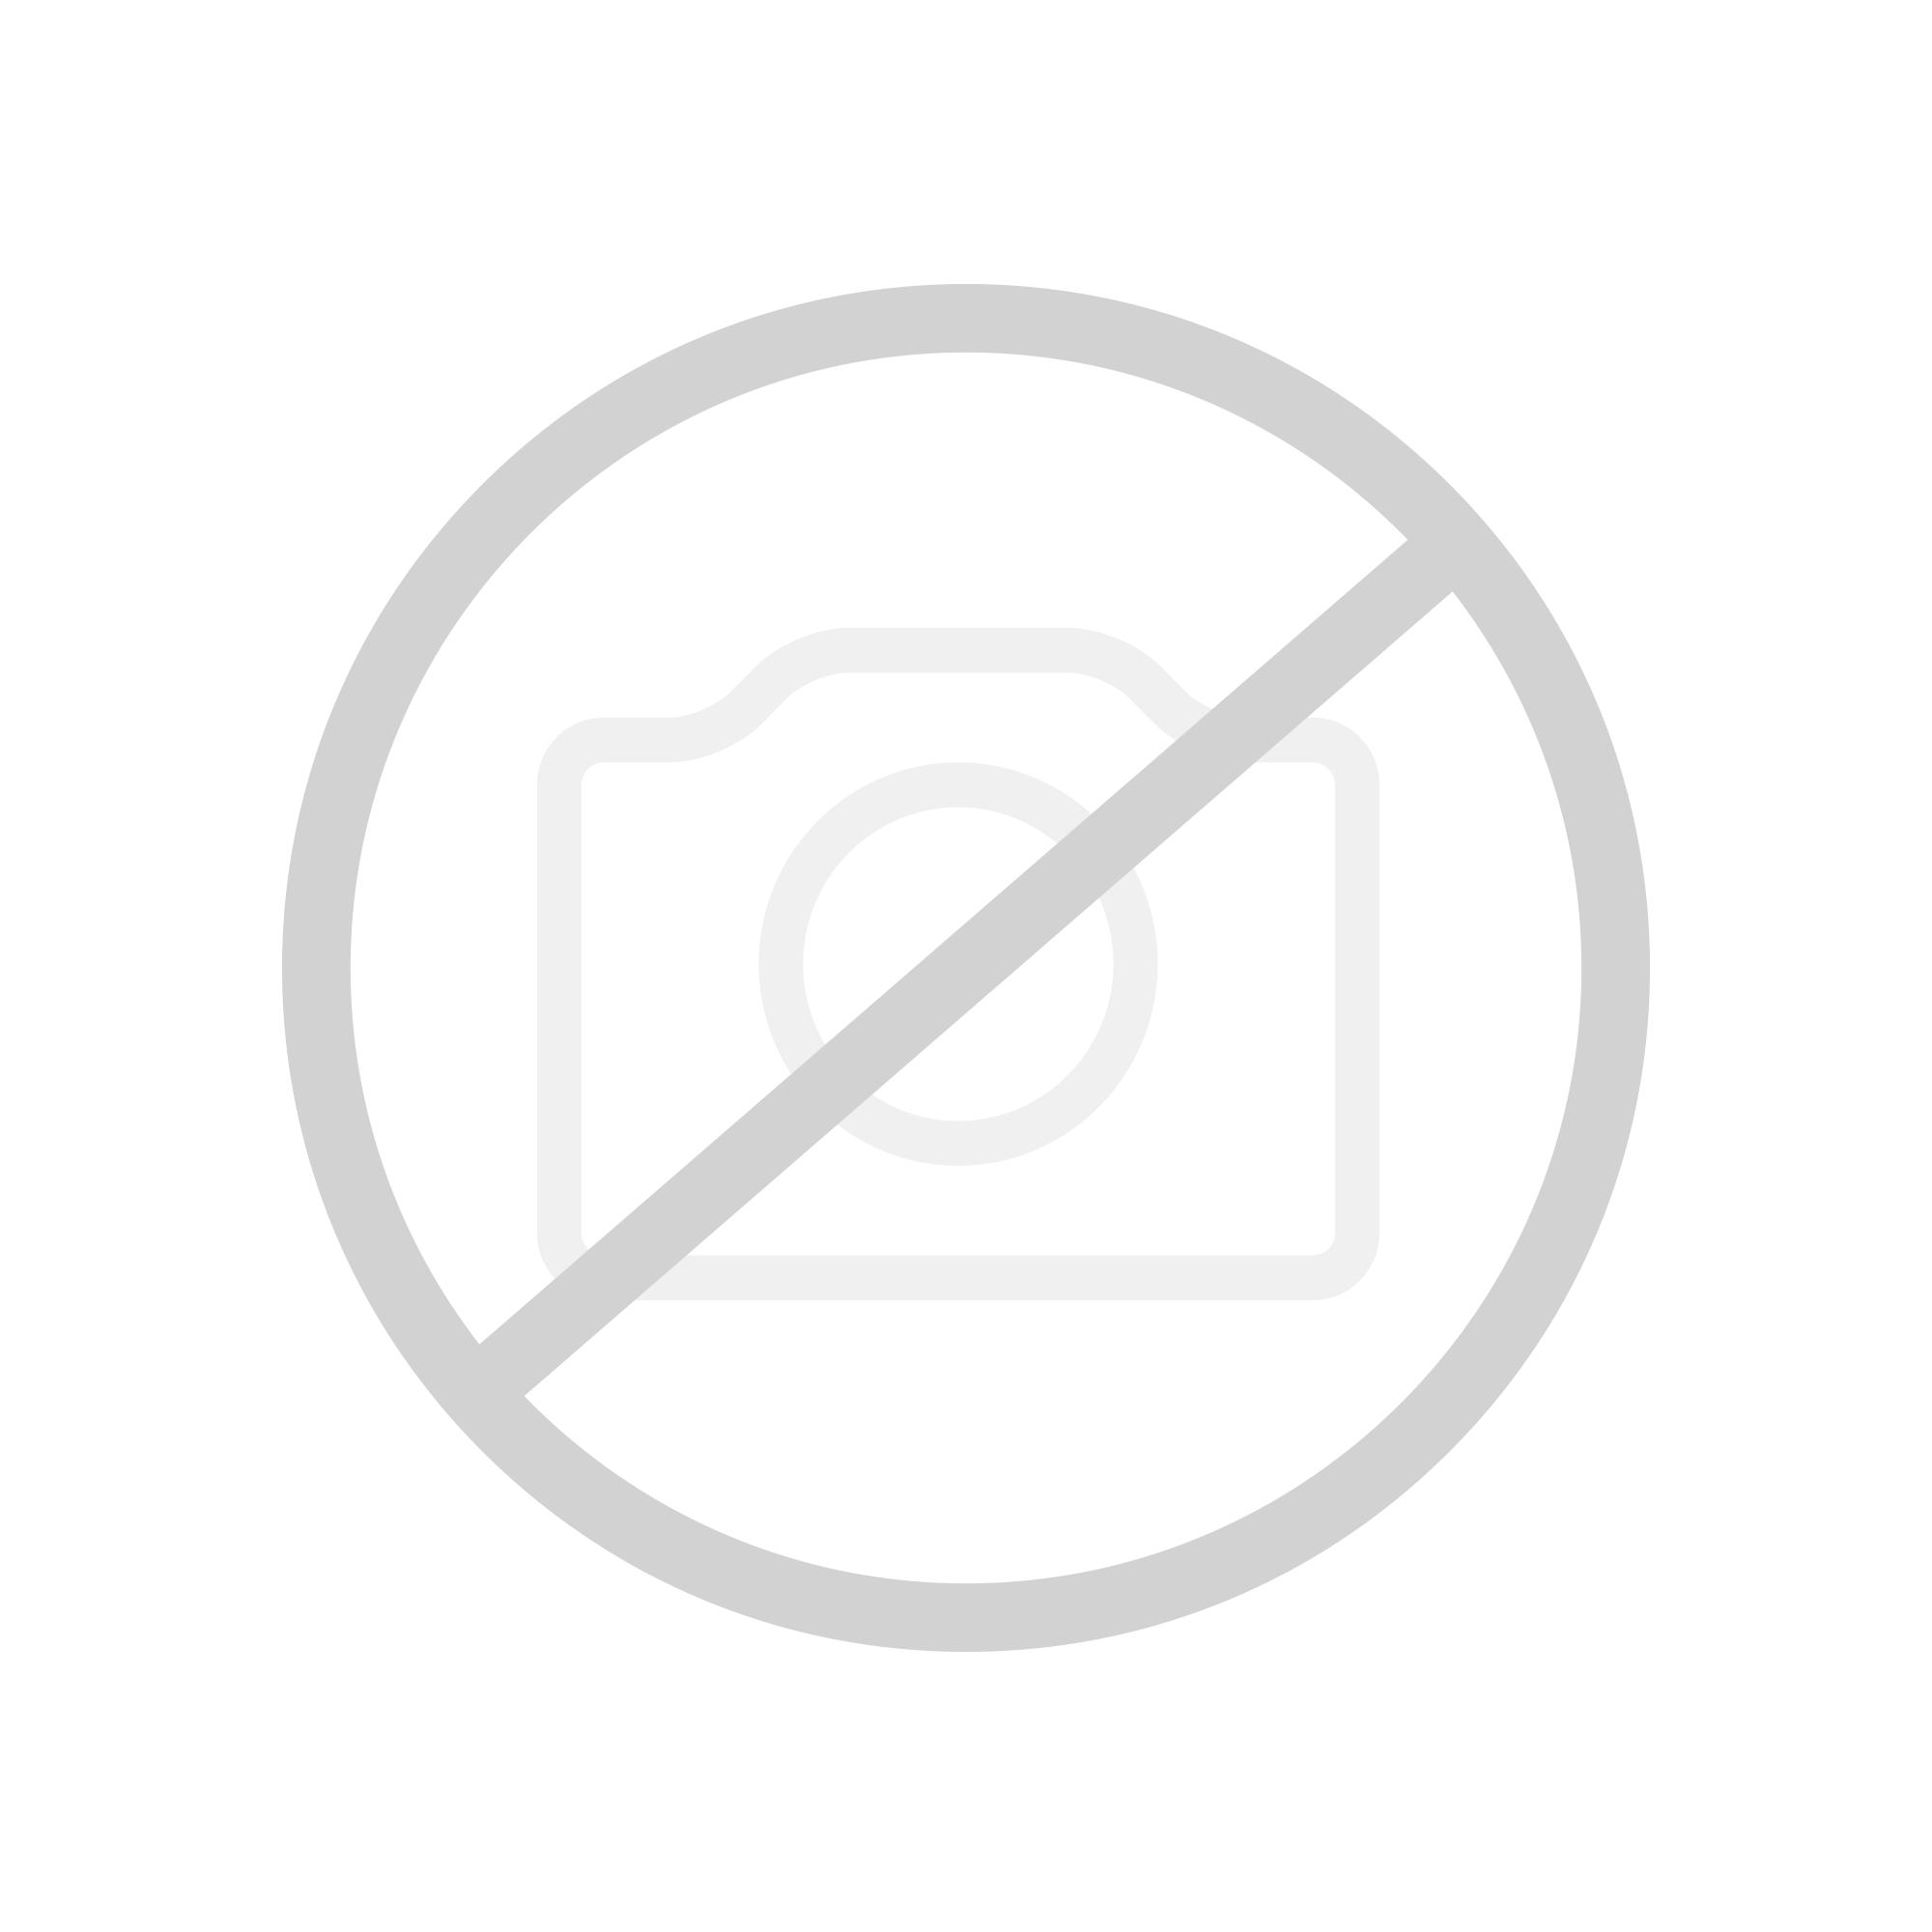 tellkamp neon freistehende oval badewanne 0100 089 a cr reuter onlineshop. Black Bedroom Furniture Sets. Home Design Ideas